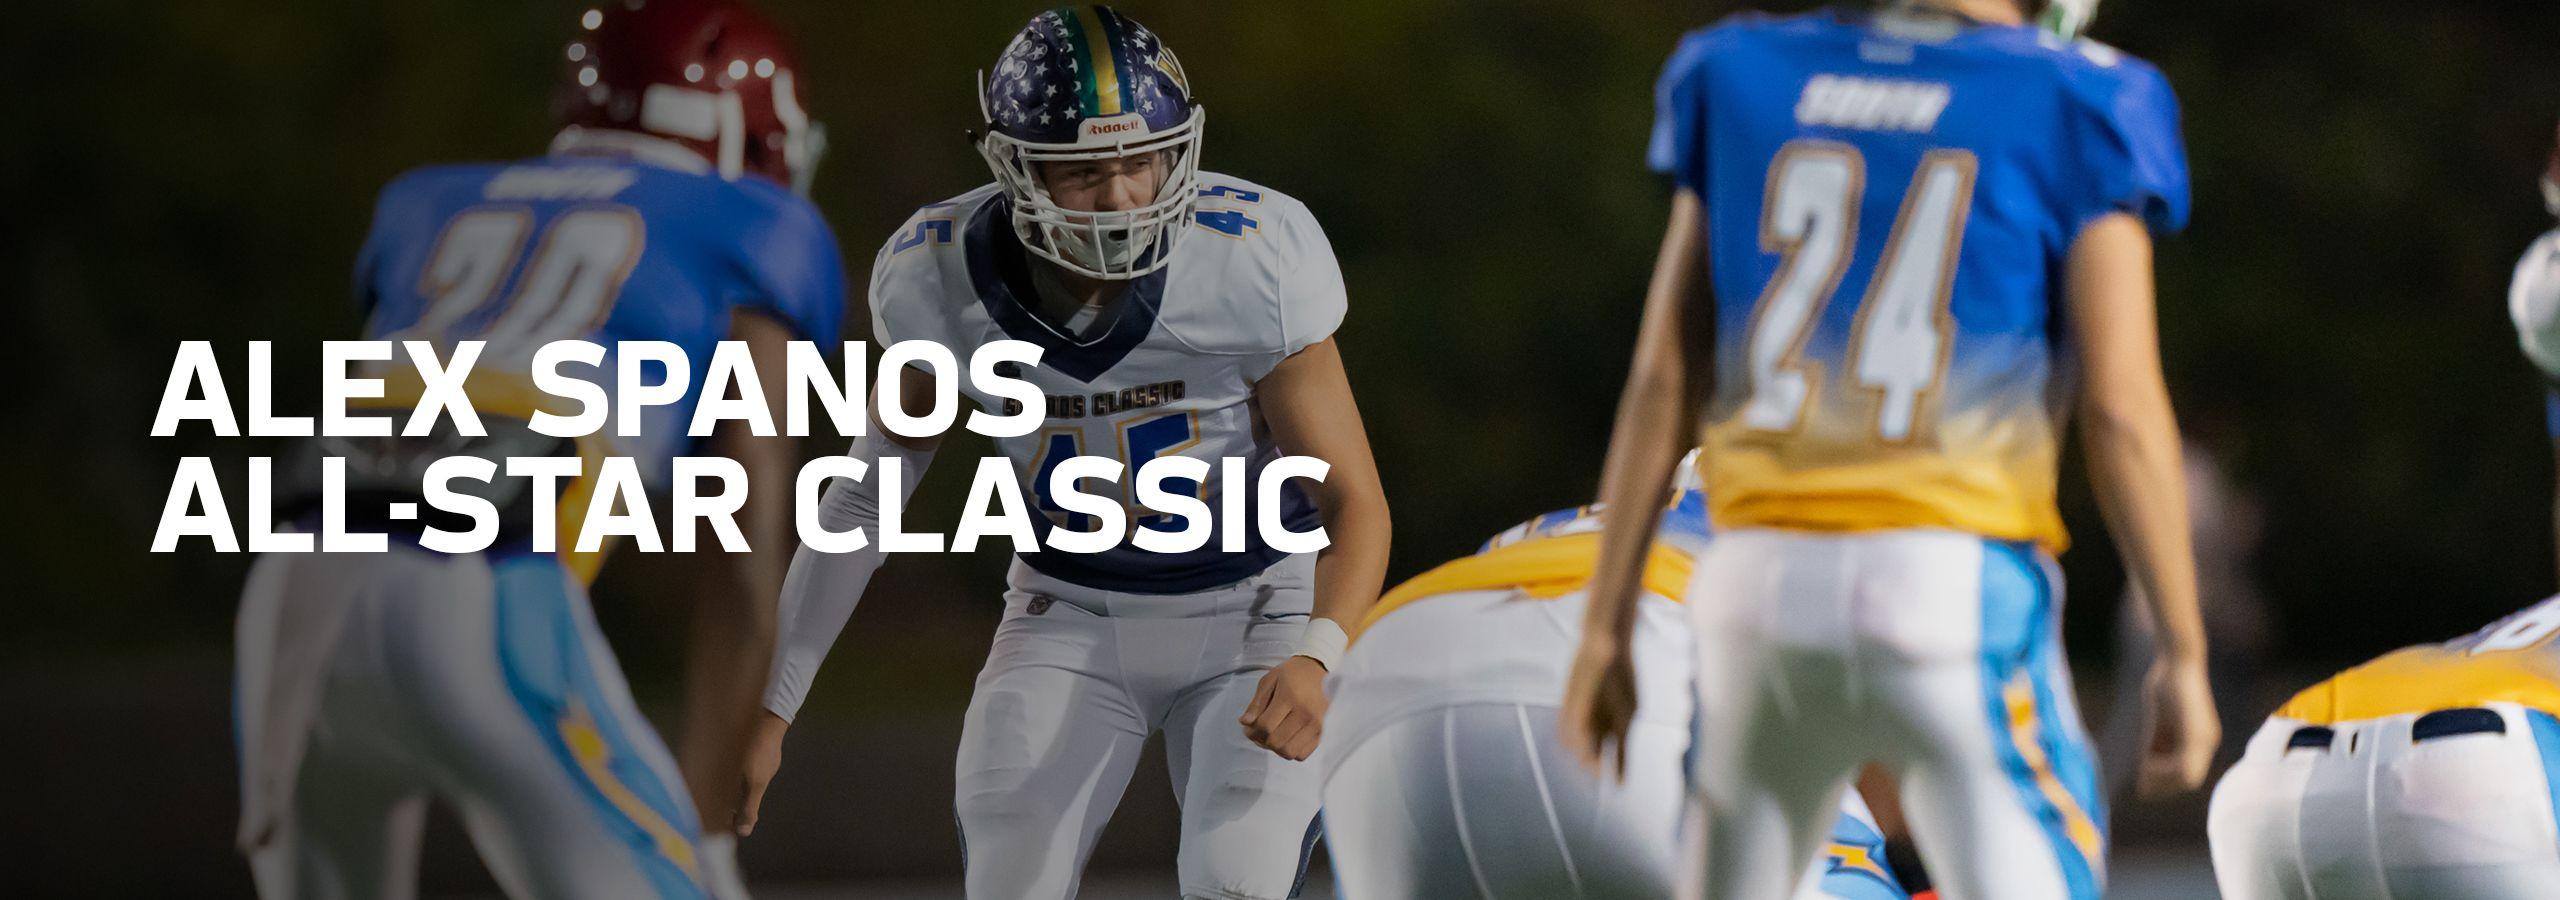 200127_Site_Header_Spanos_All-Star_Classic (1)